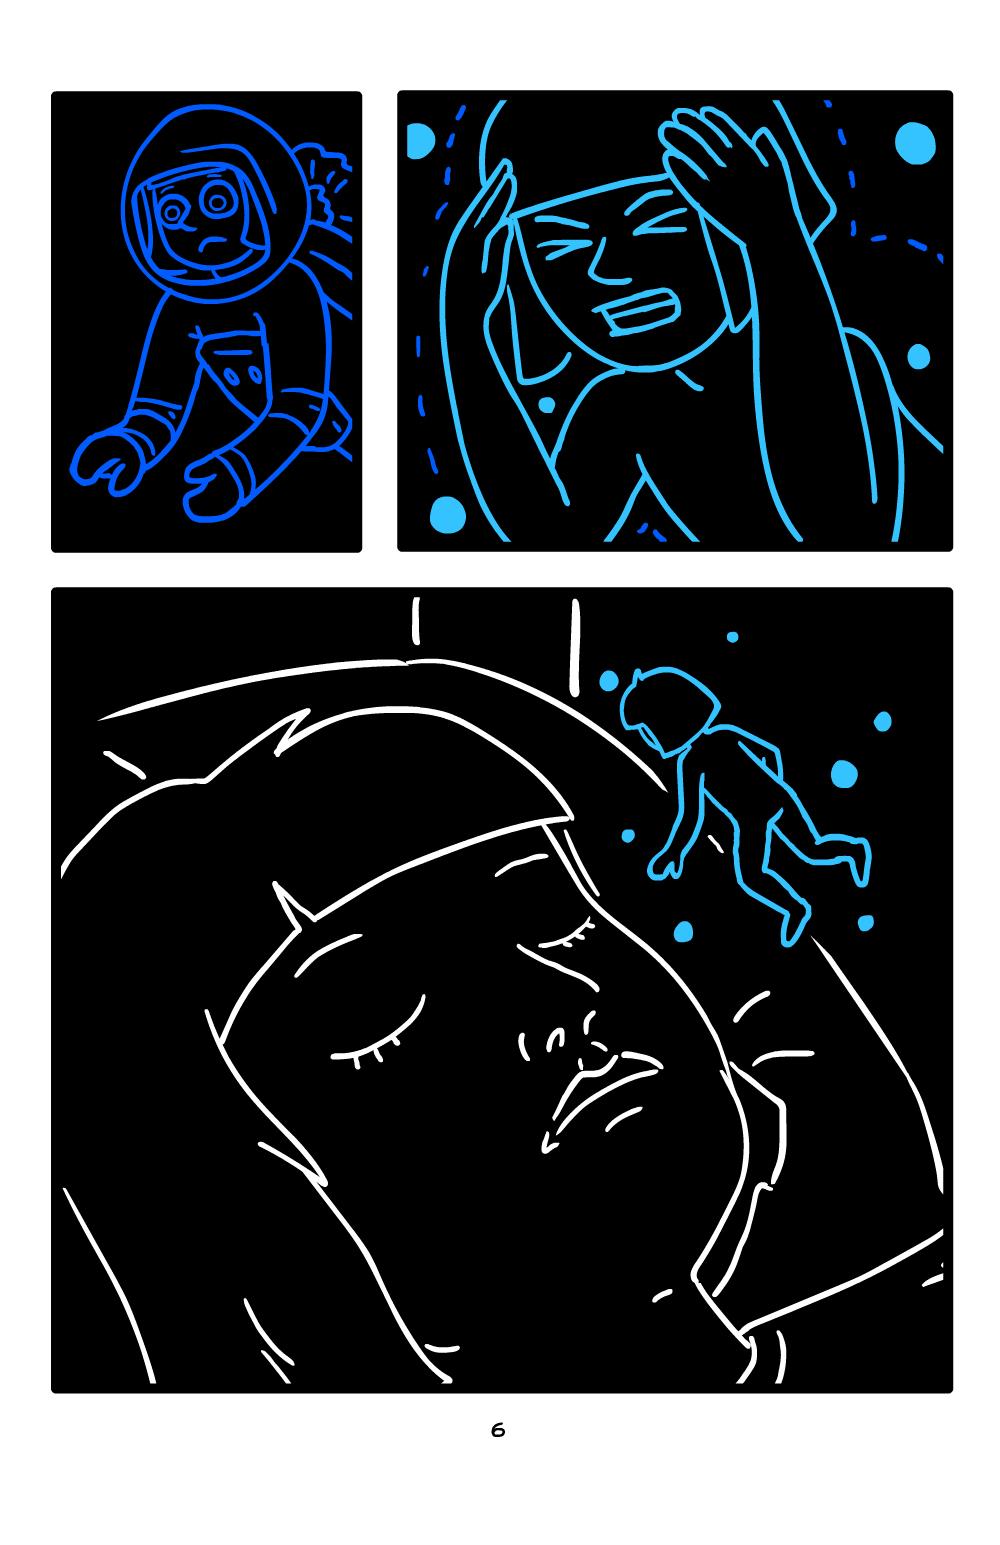 The-Body-Sleeps-9-15-06.jpg